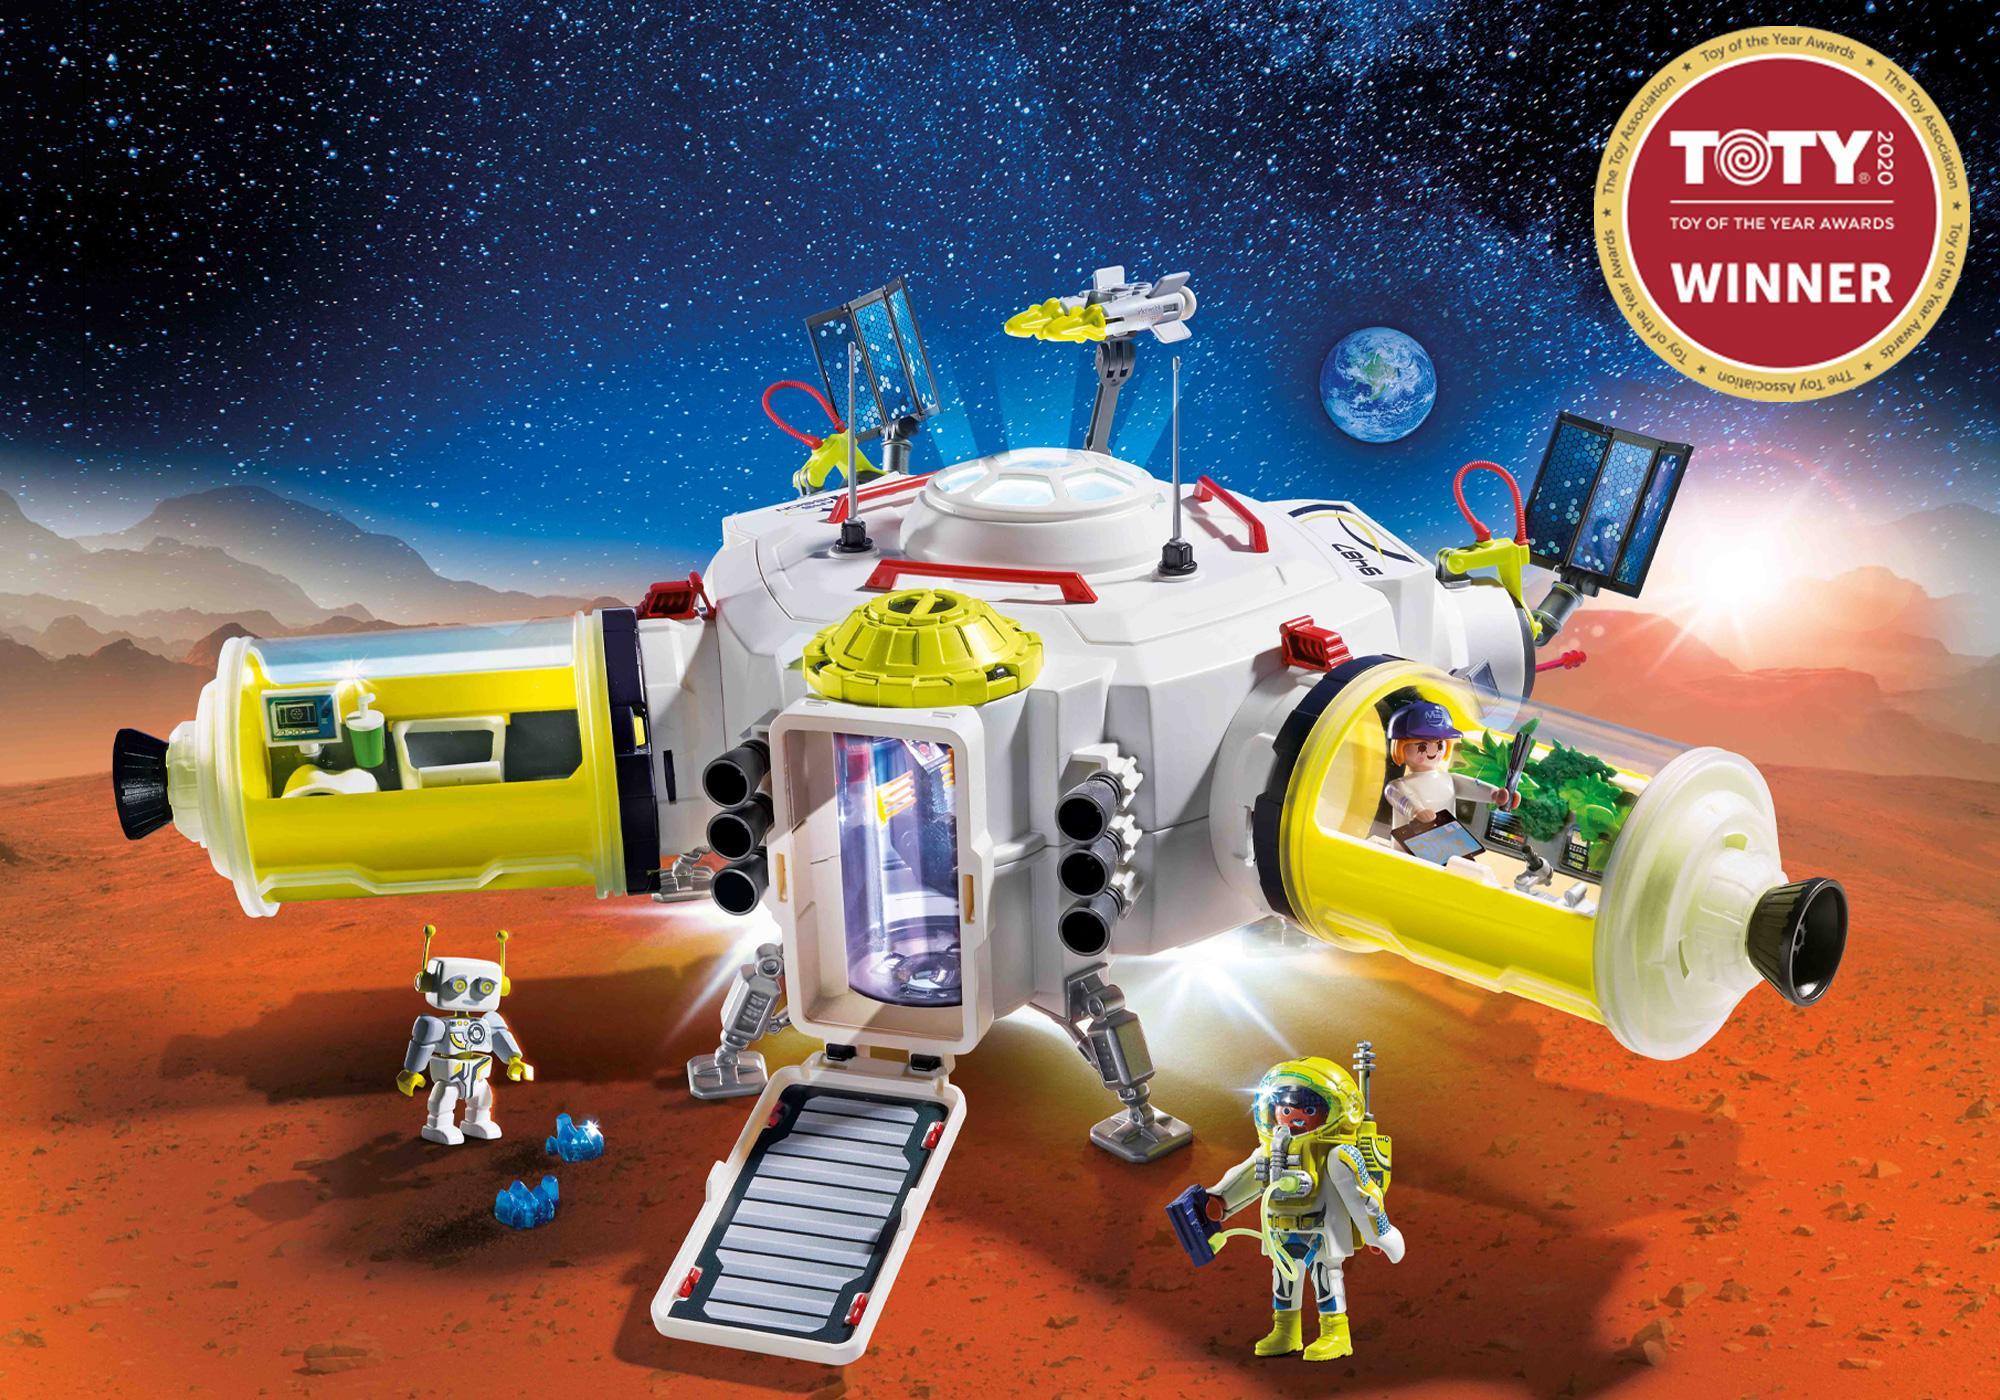 http://media.playmobil.com/i/playmobil/9487_product_detail/Mars Space Station